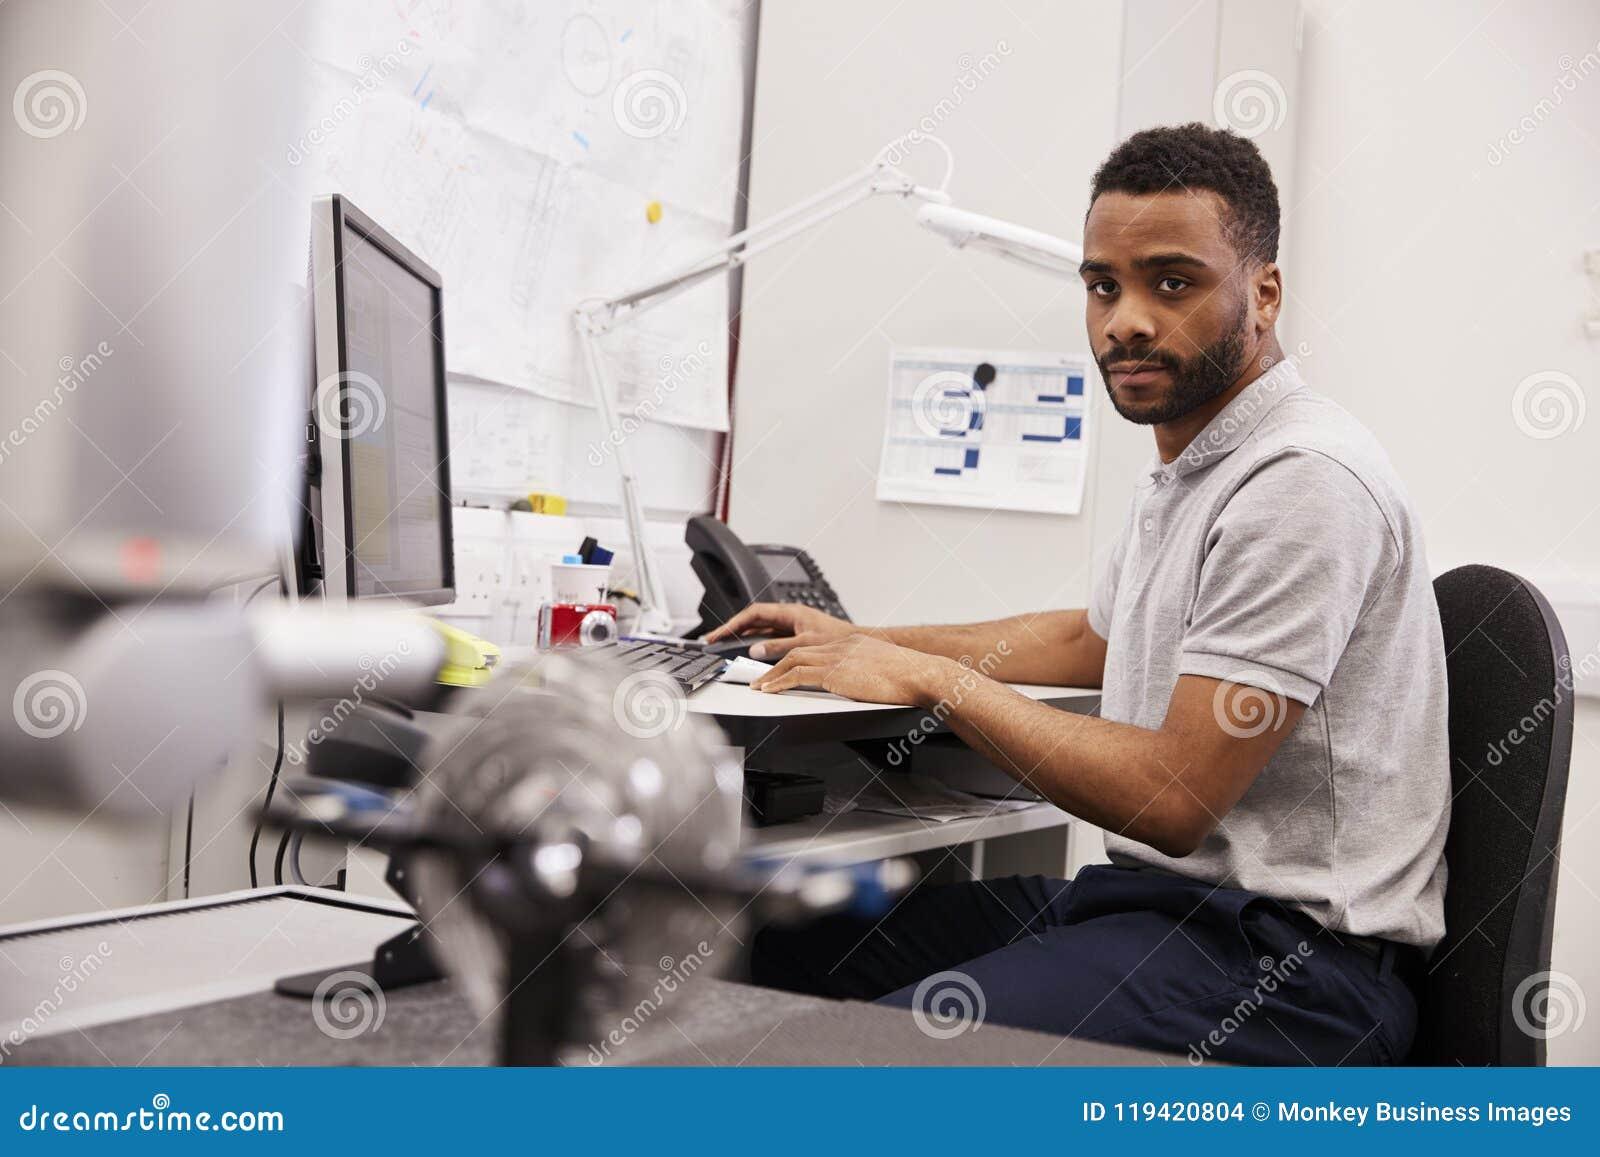 Mannelijke Ingenieur Uses CMM Gecoördineerde Metende Machine in Fabriek